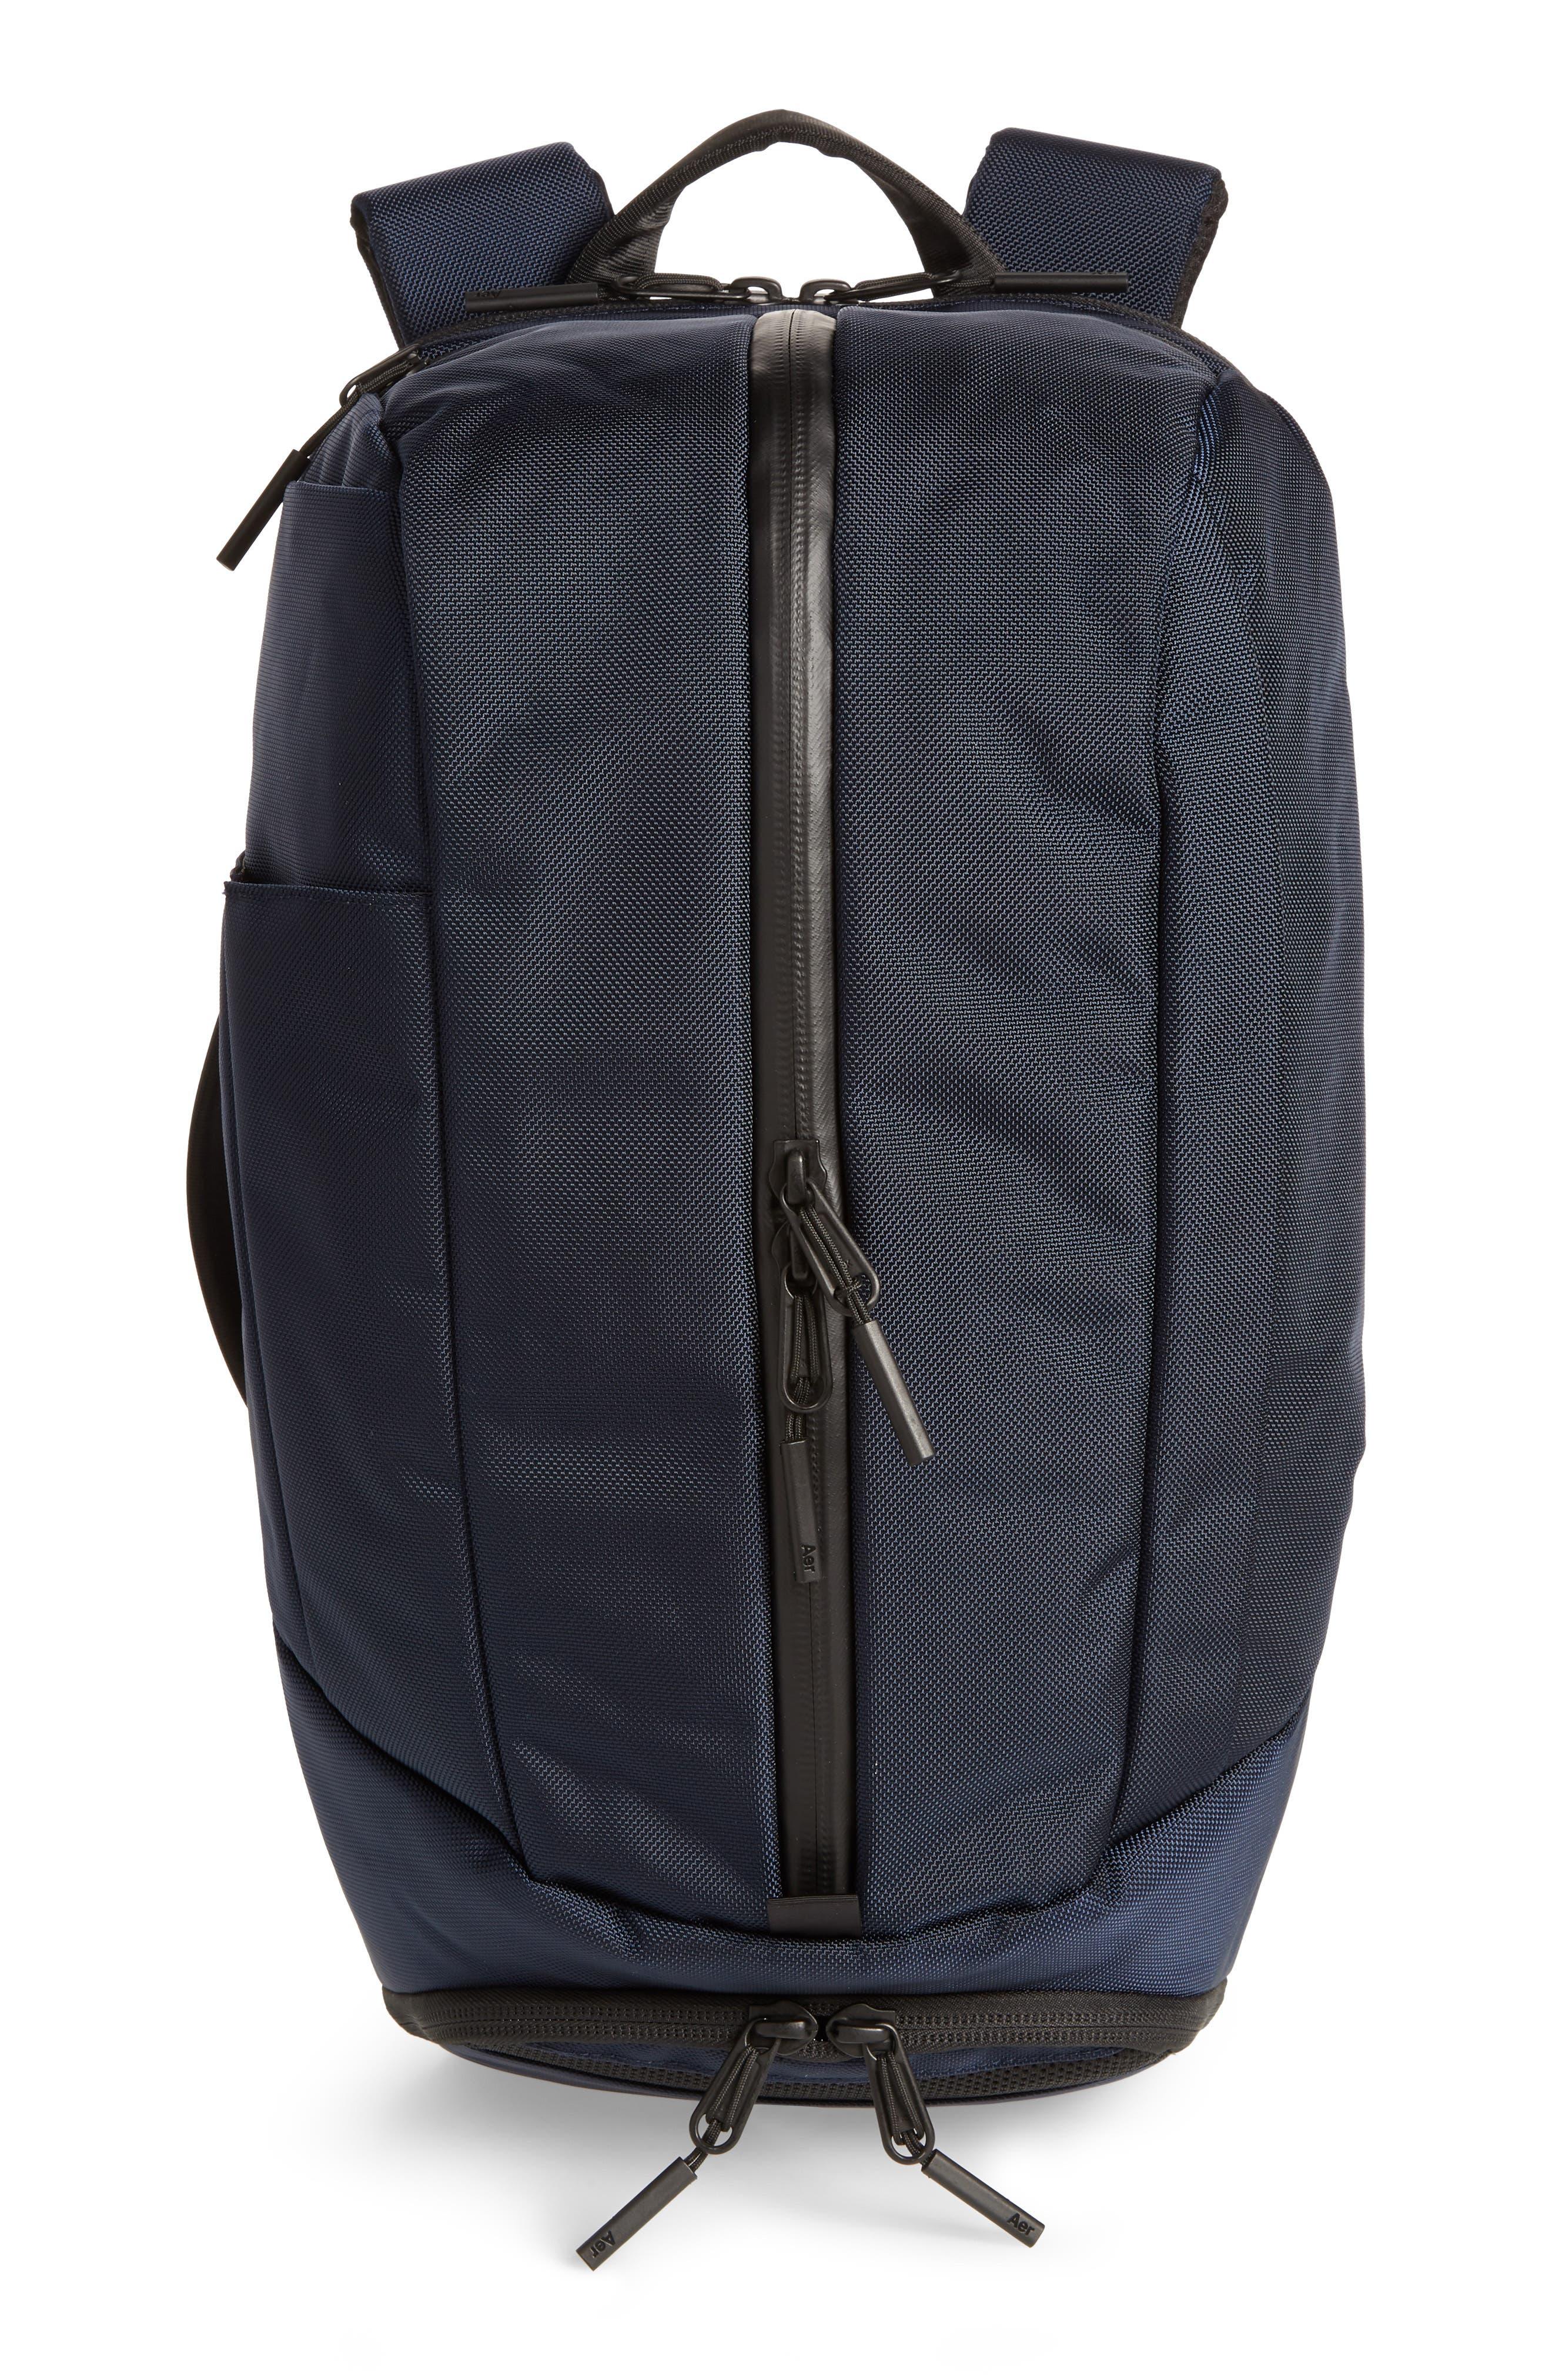 Duffel Pack 2 Convertible Backpack,                             Main thumbnail 1, color,                             Navy